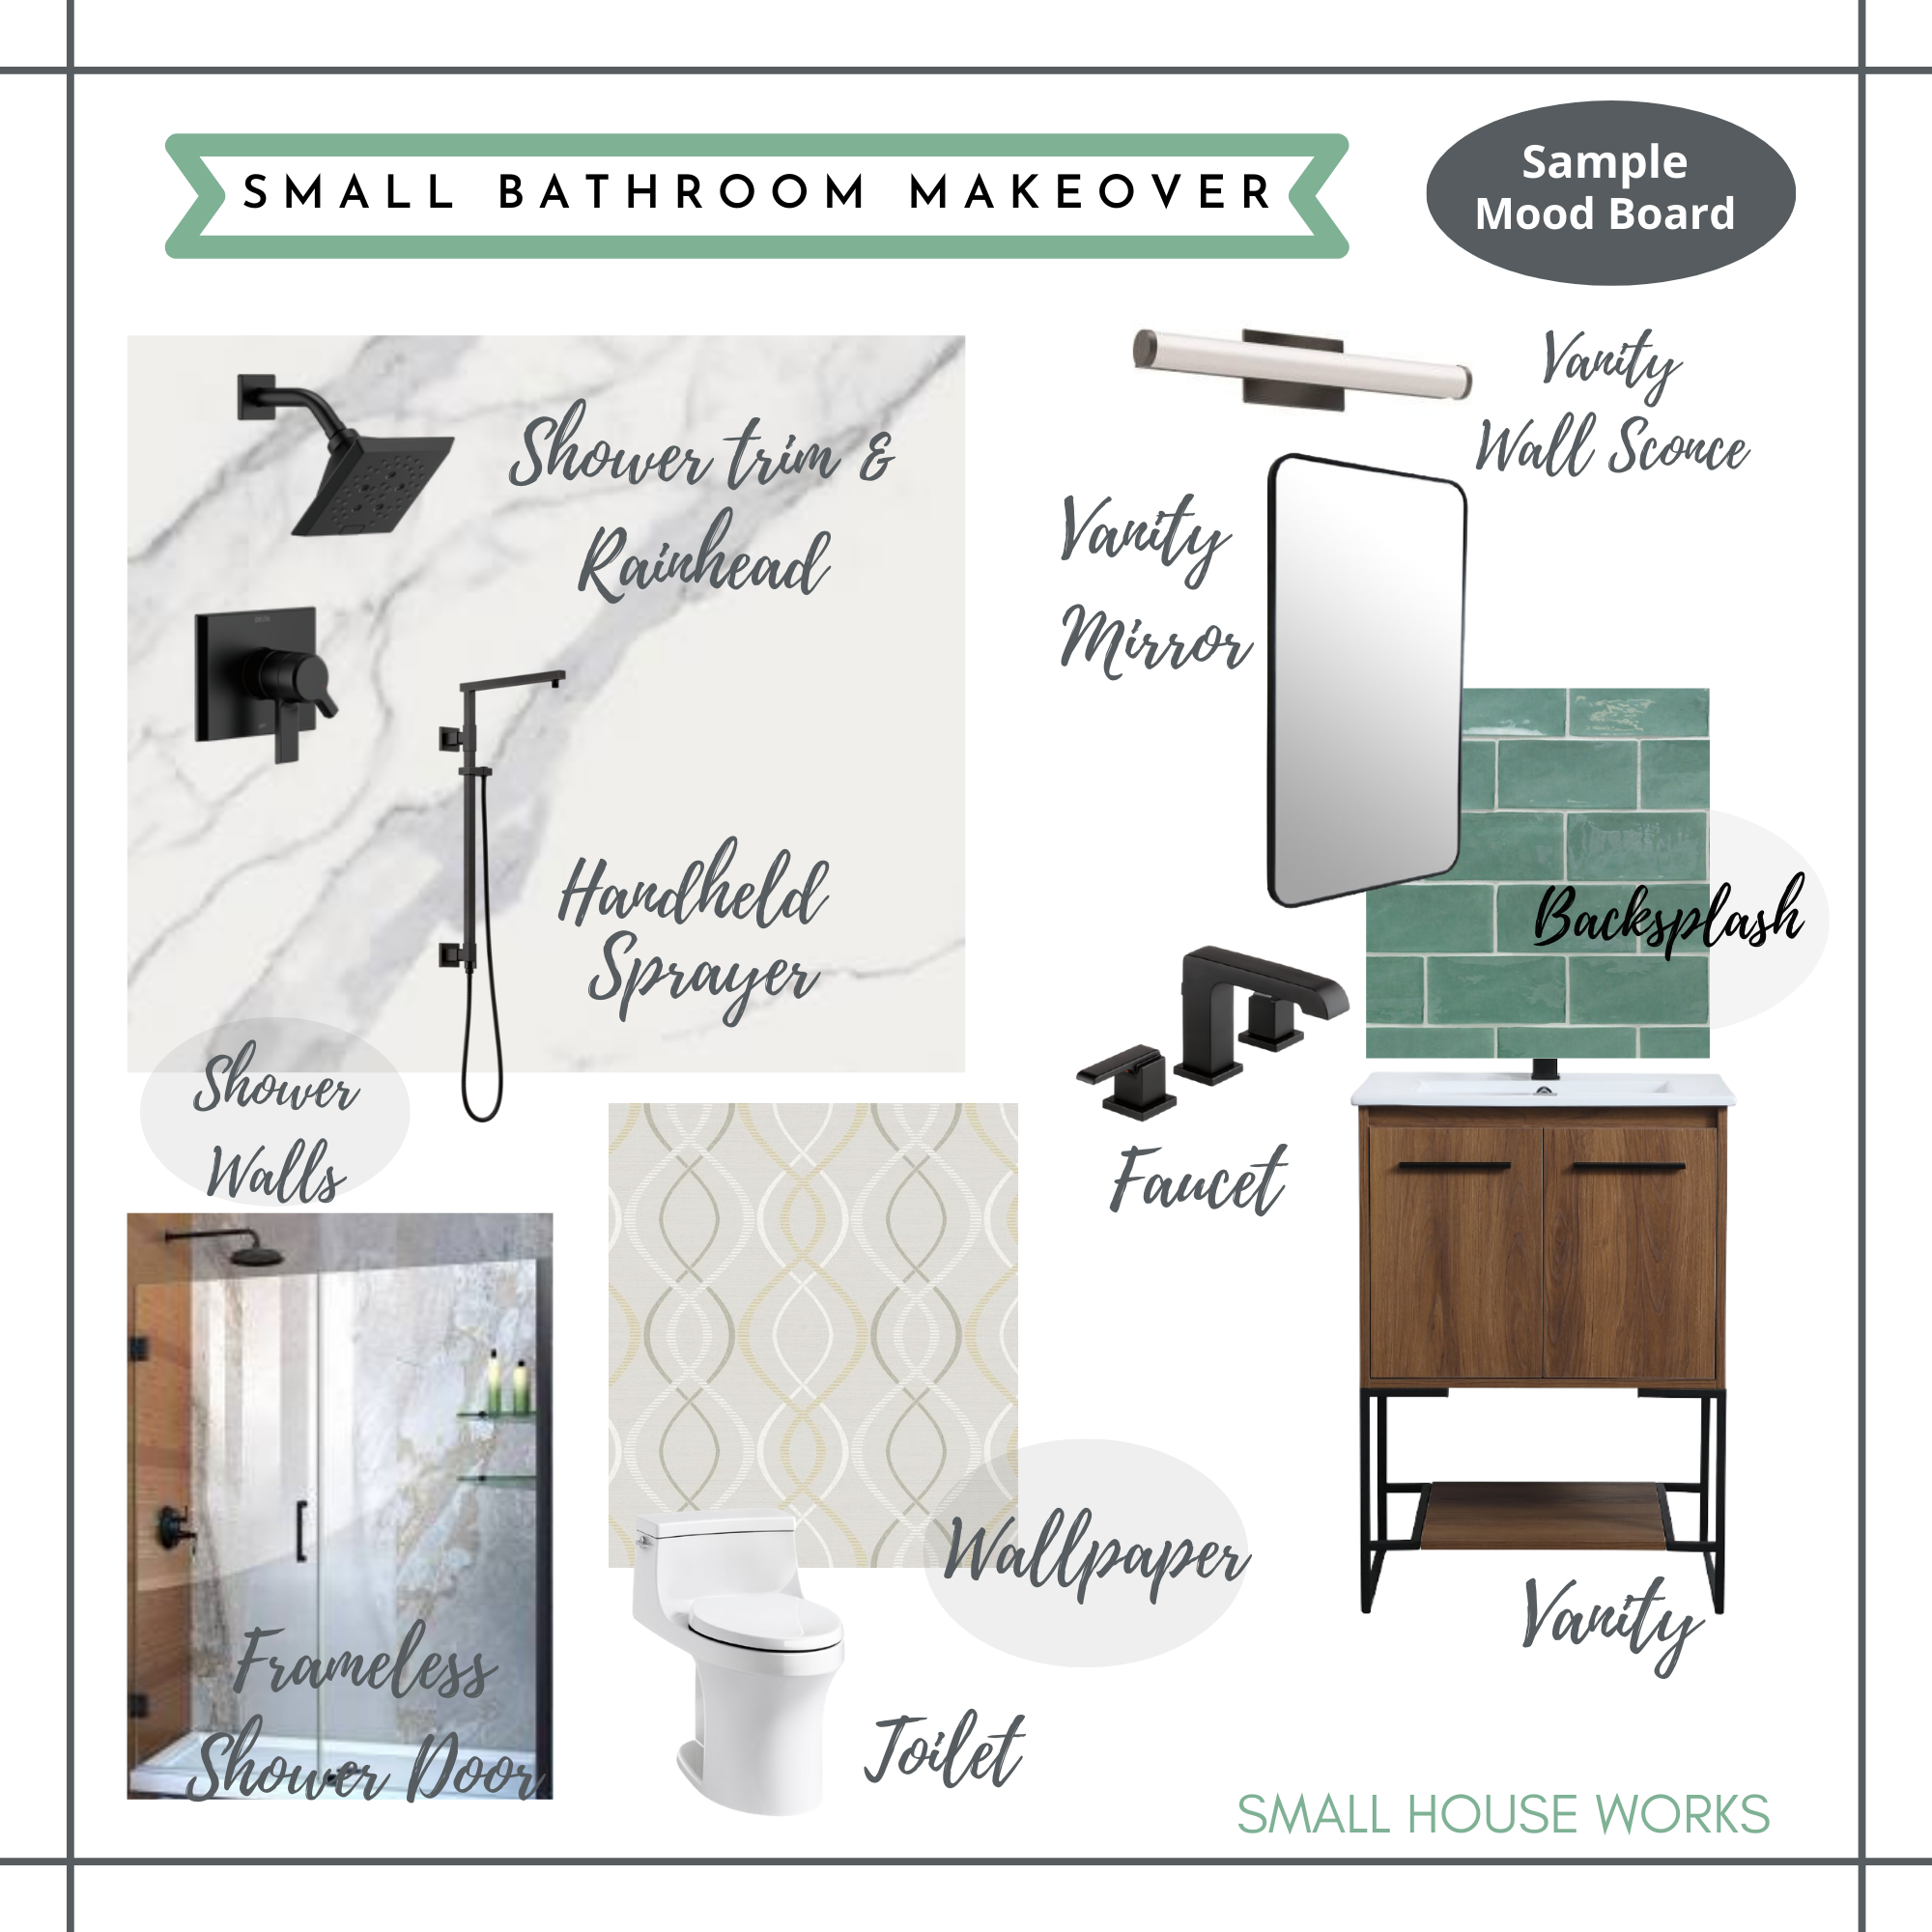 SAMPLE DESIGN| MOOD BOARD-SMALL BATHROOM